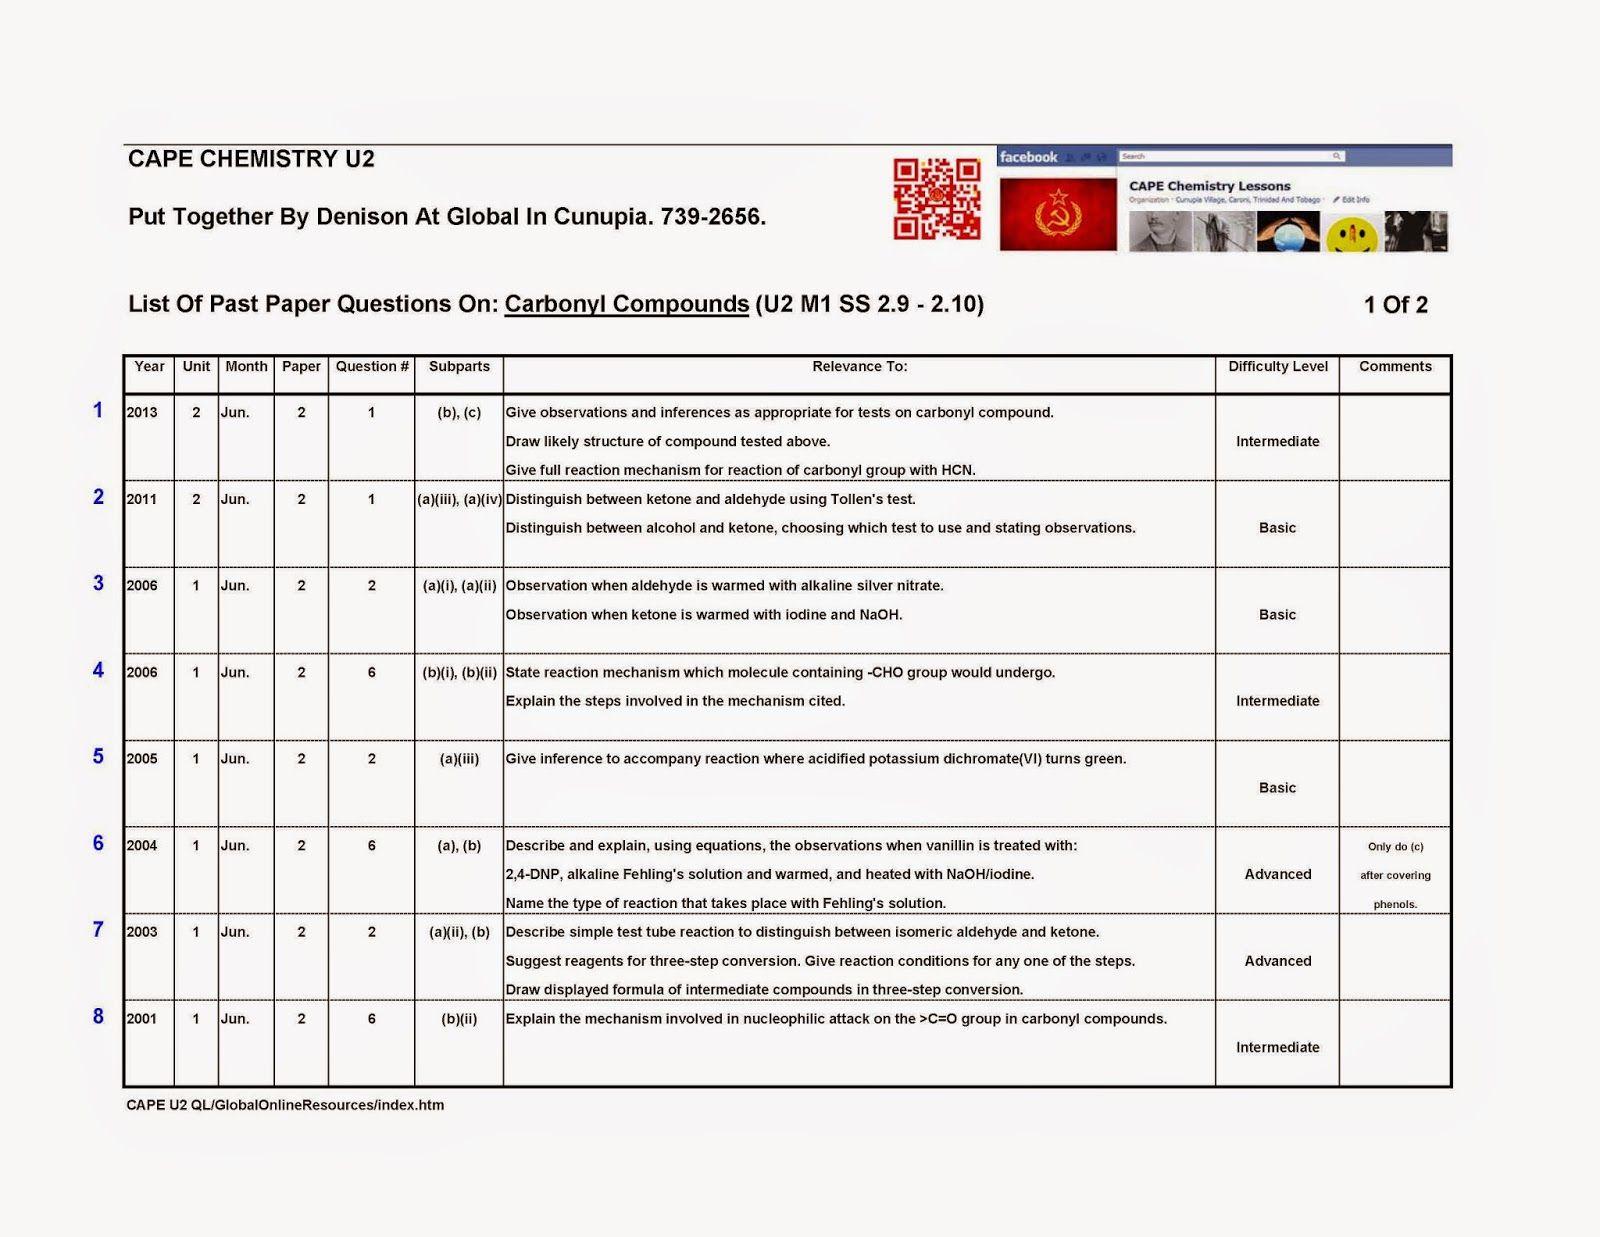 CAPE Chemistry Question Lists - Unit 2: 06 U2 M1 SS 2 9